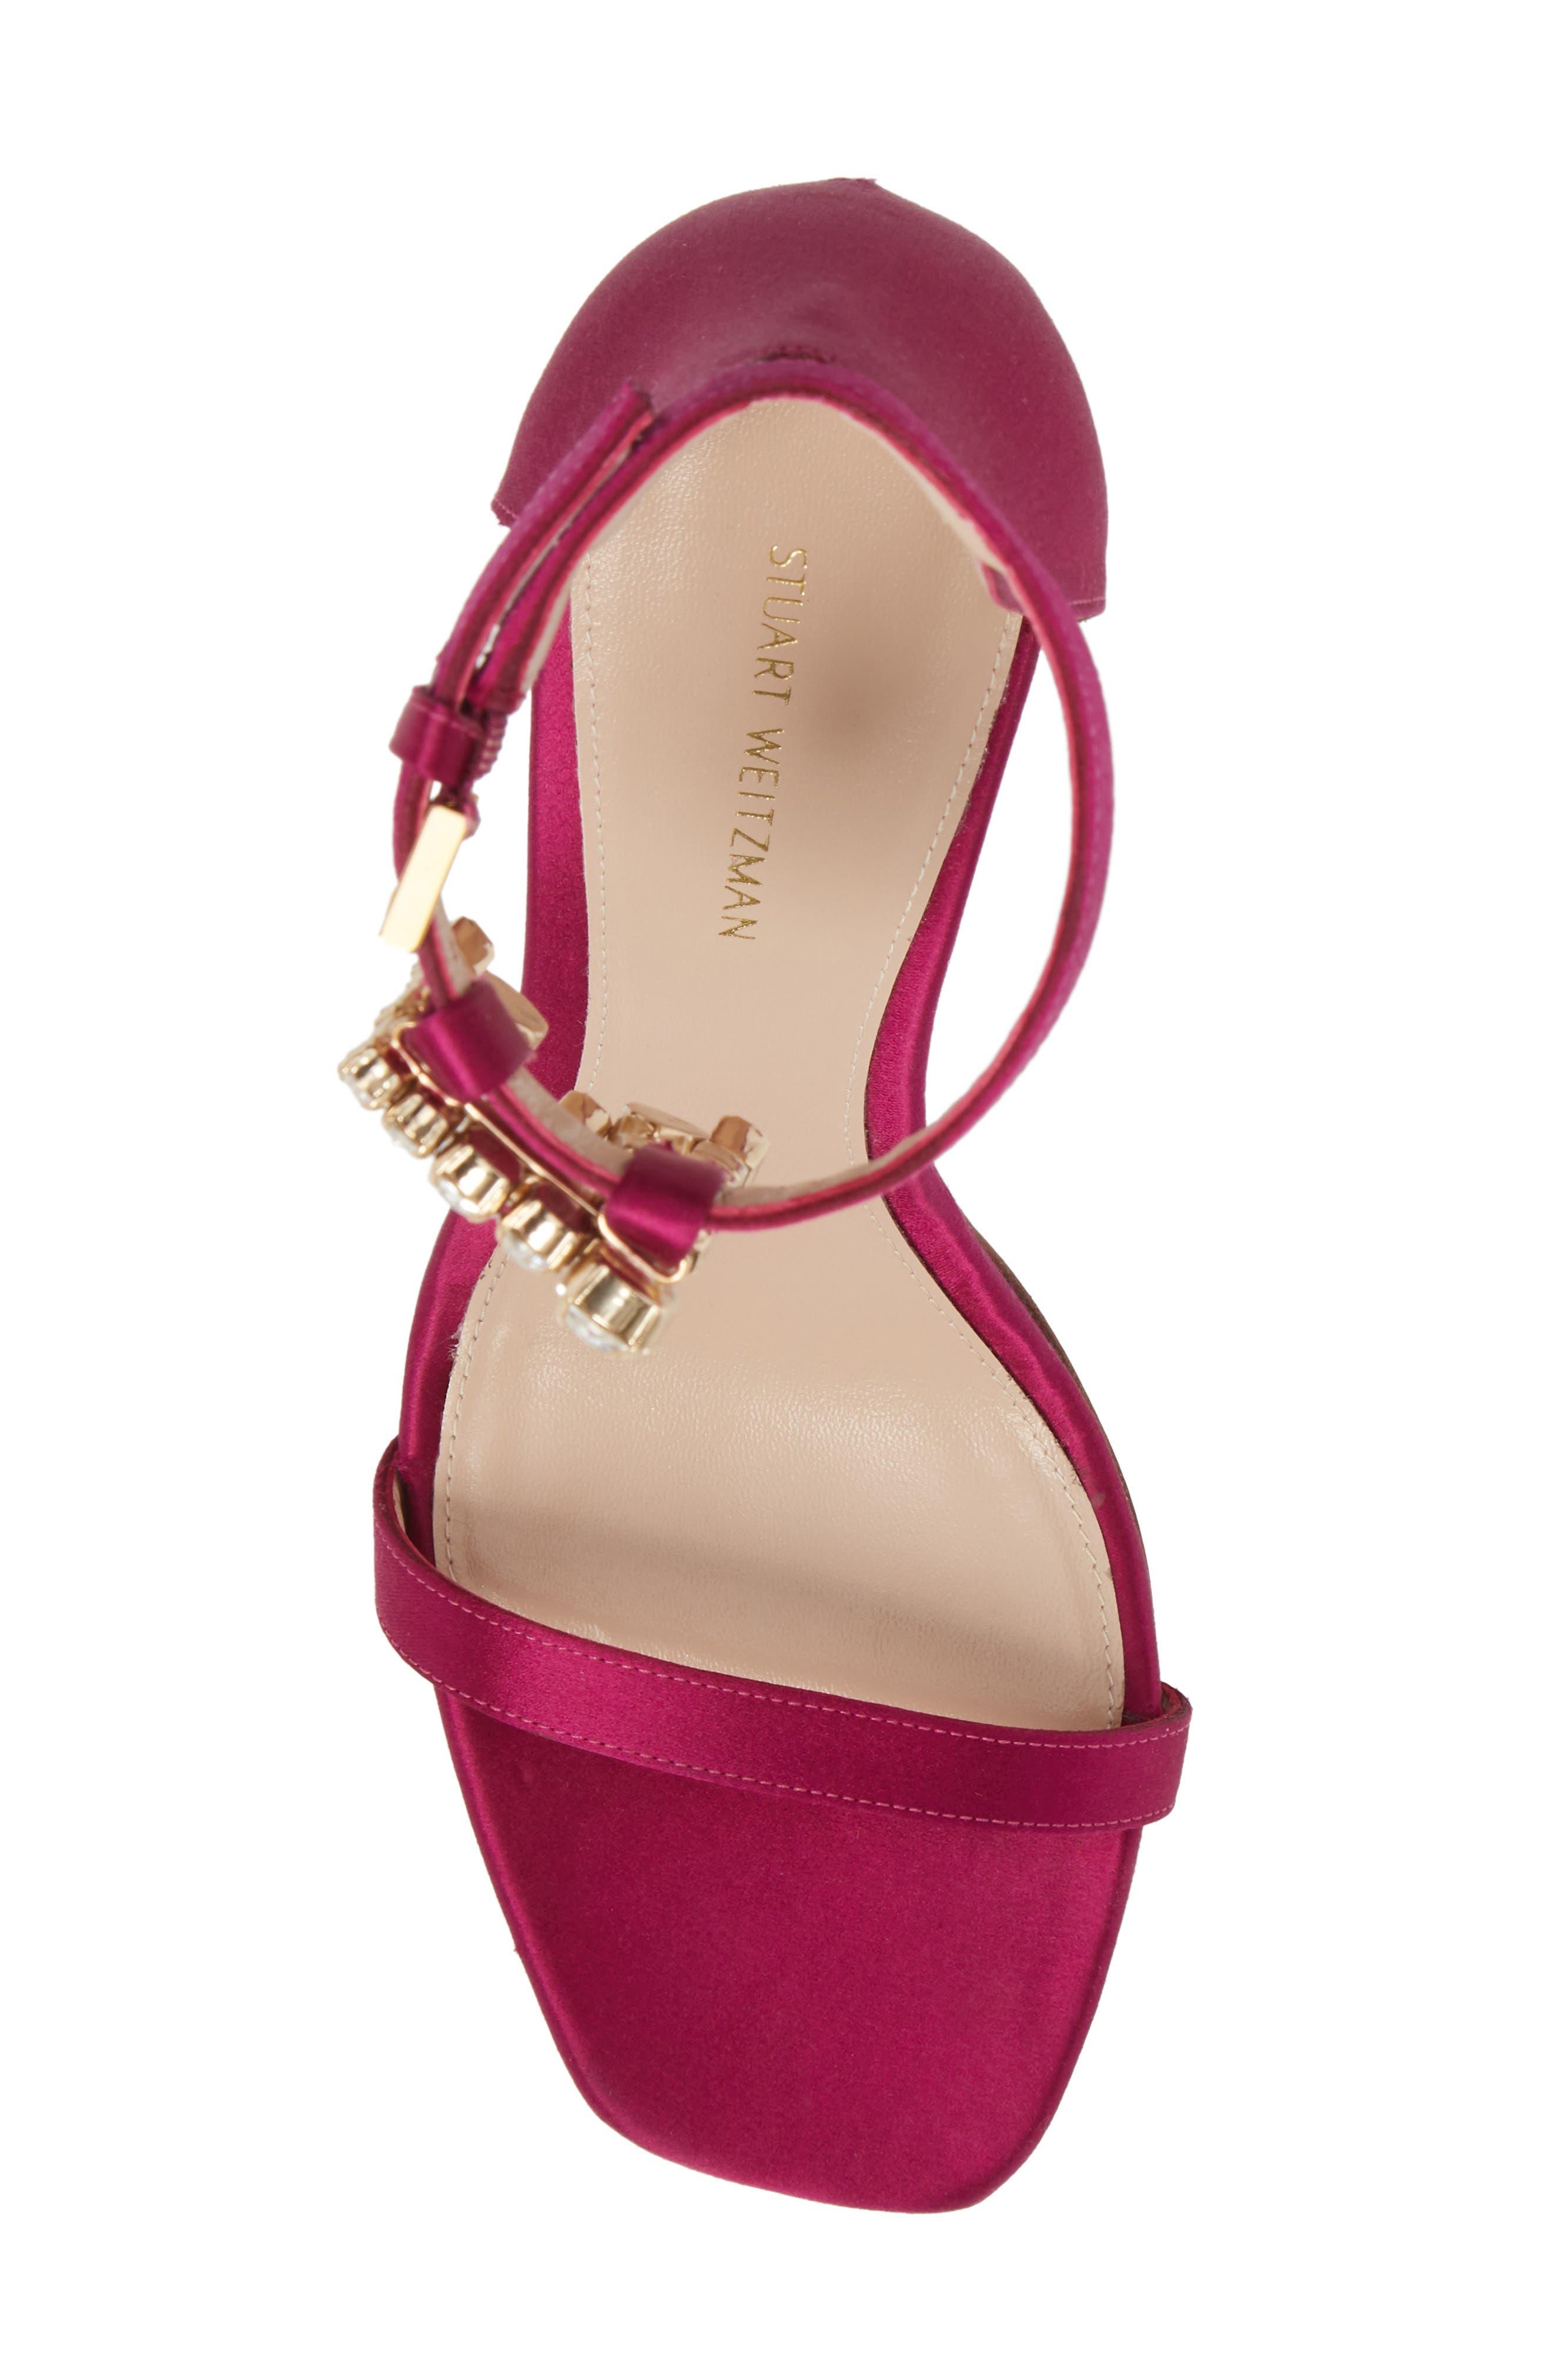 100FRINGESQUARENUDIST Sandal,                             Alternate thumbnail 5, color,                             Grape Silk Satin